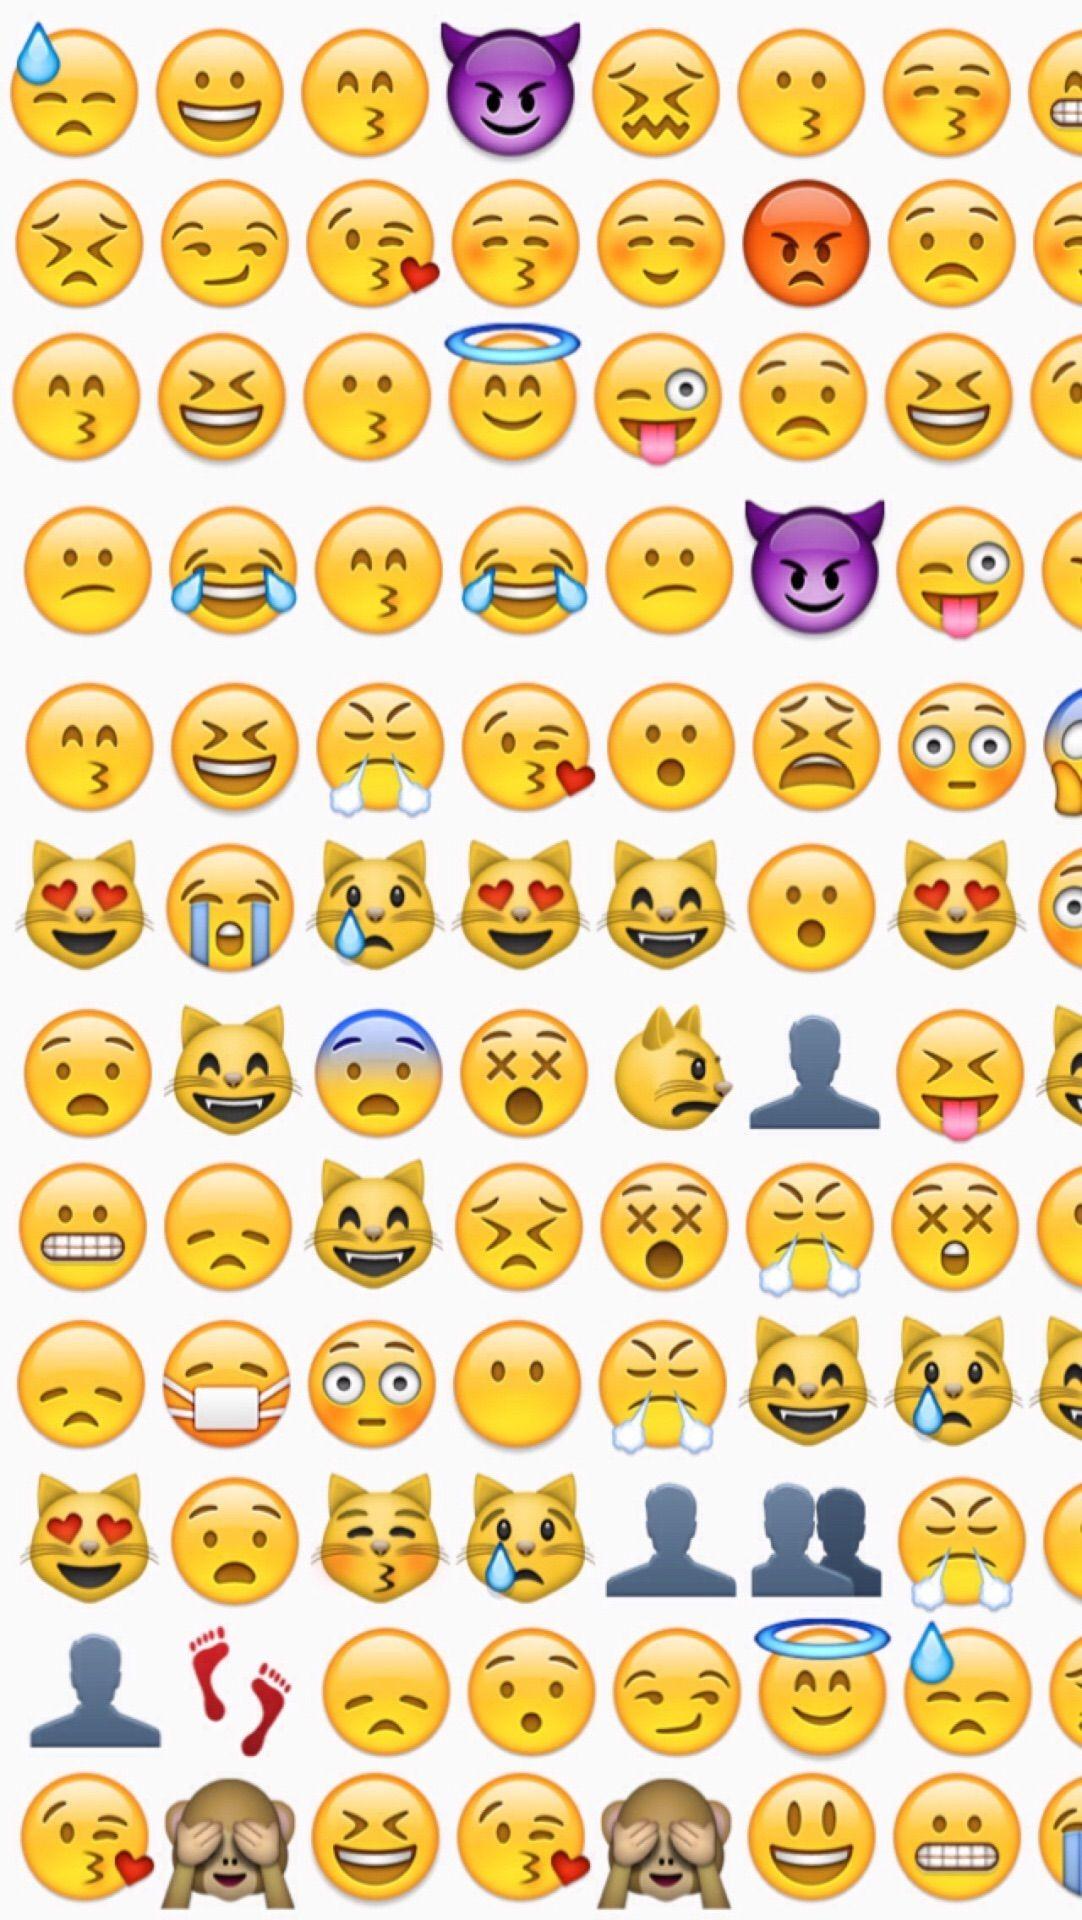 1517673 free emojis wallpaper iphone icons 1082x1920 full hd